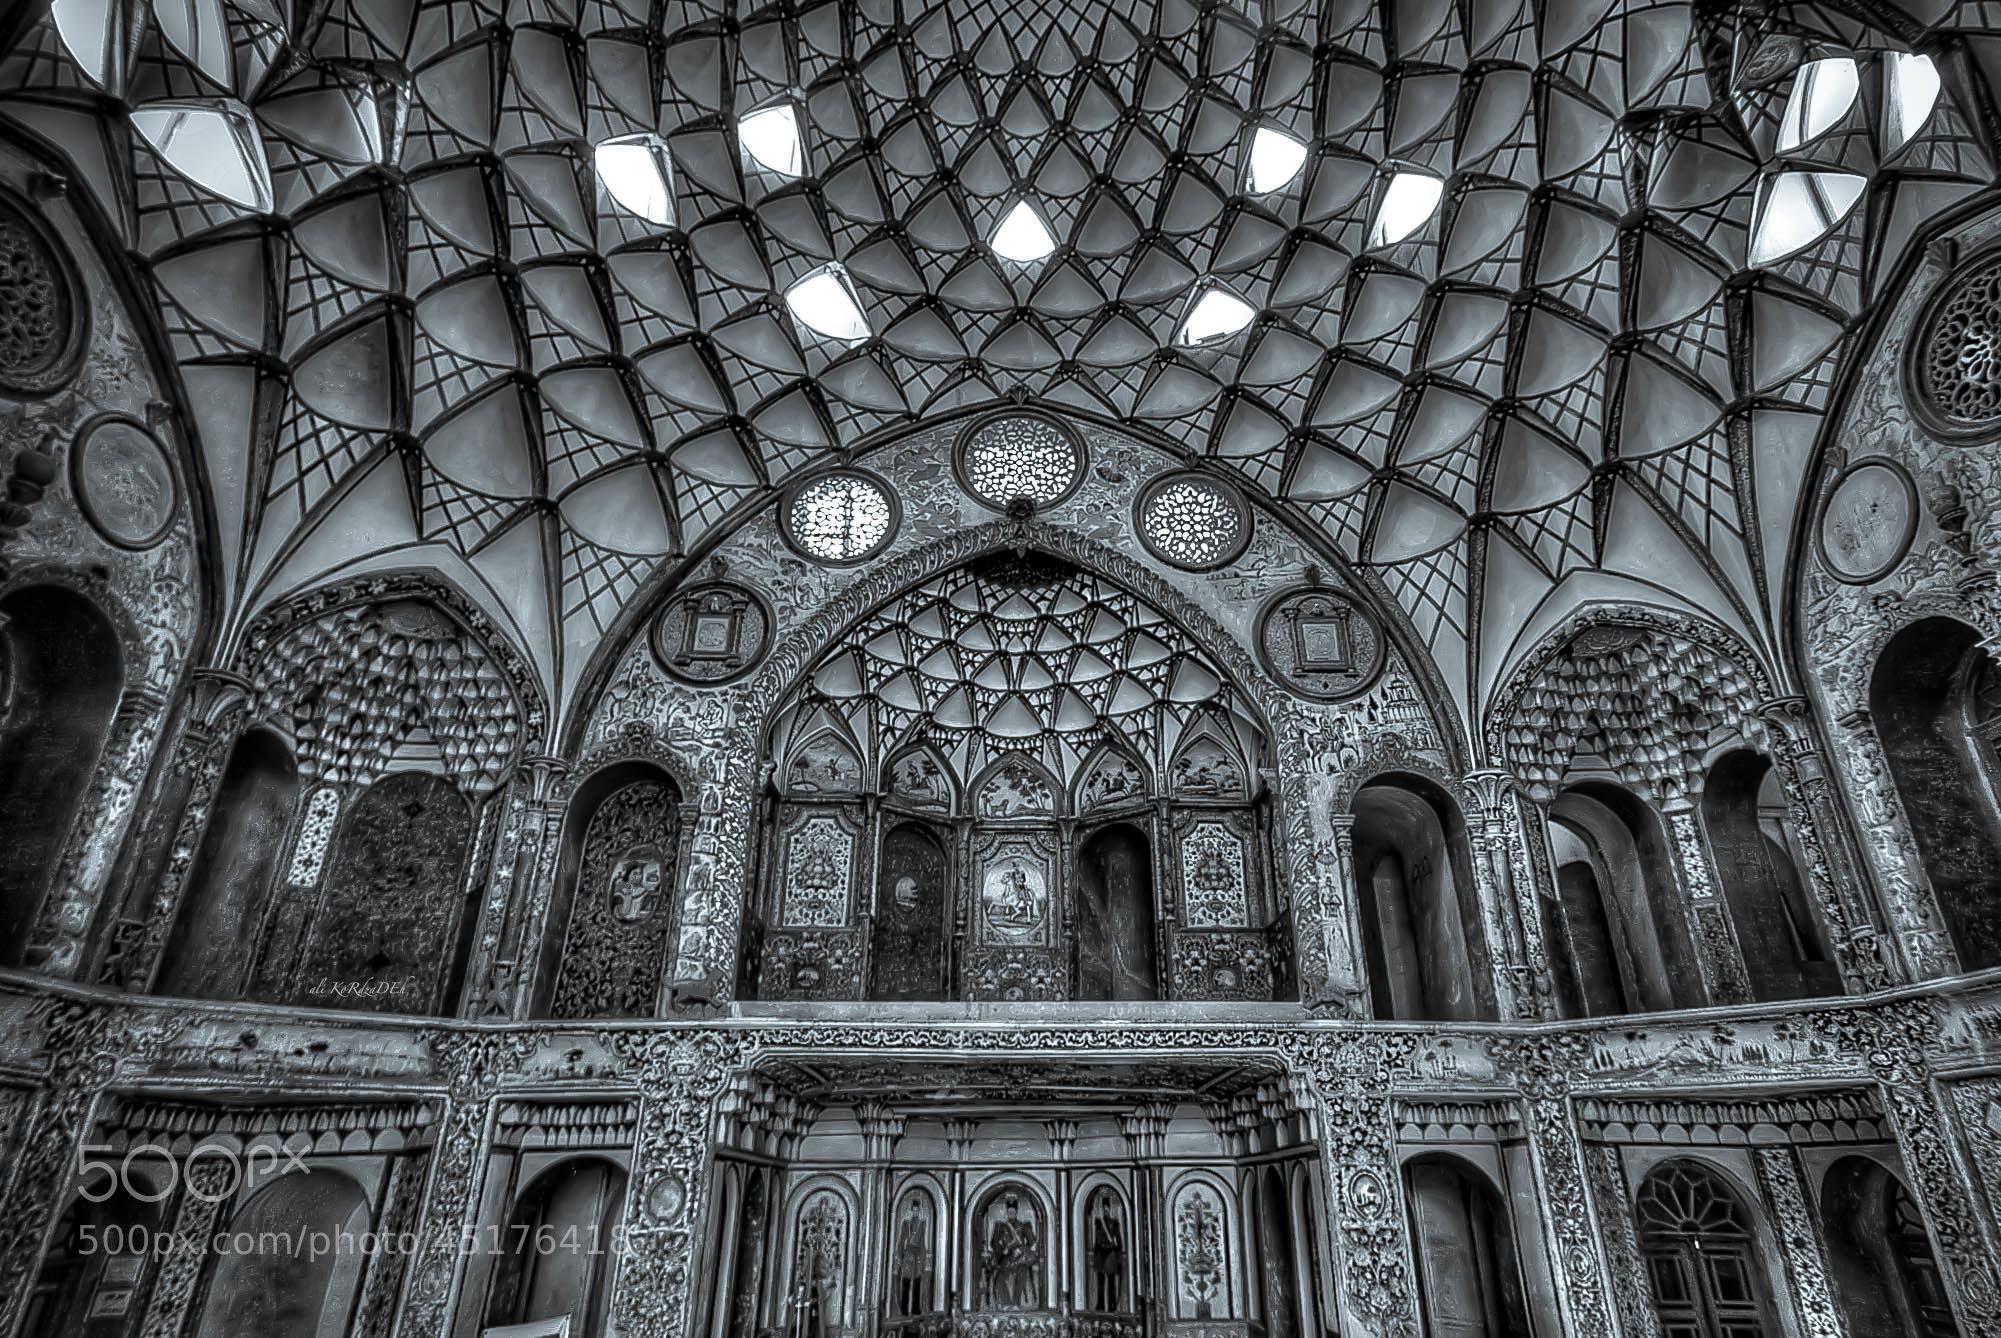 Photograph Artisans by Ali KoRdZaDeh on 500px